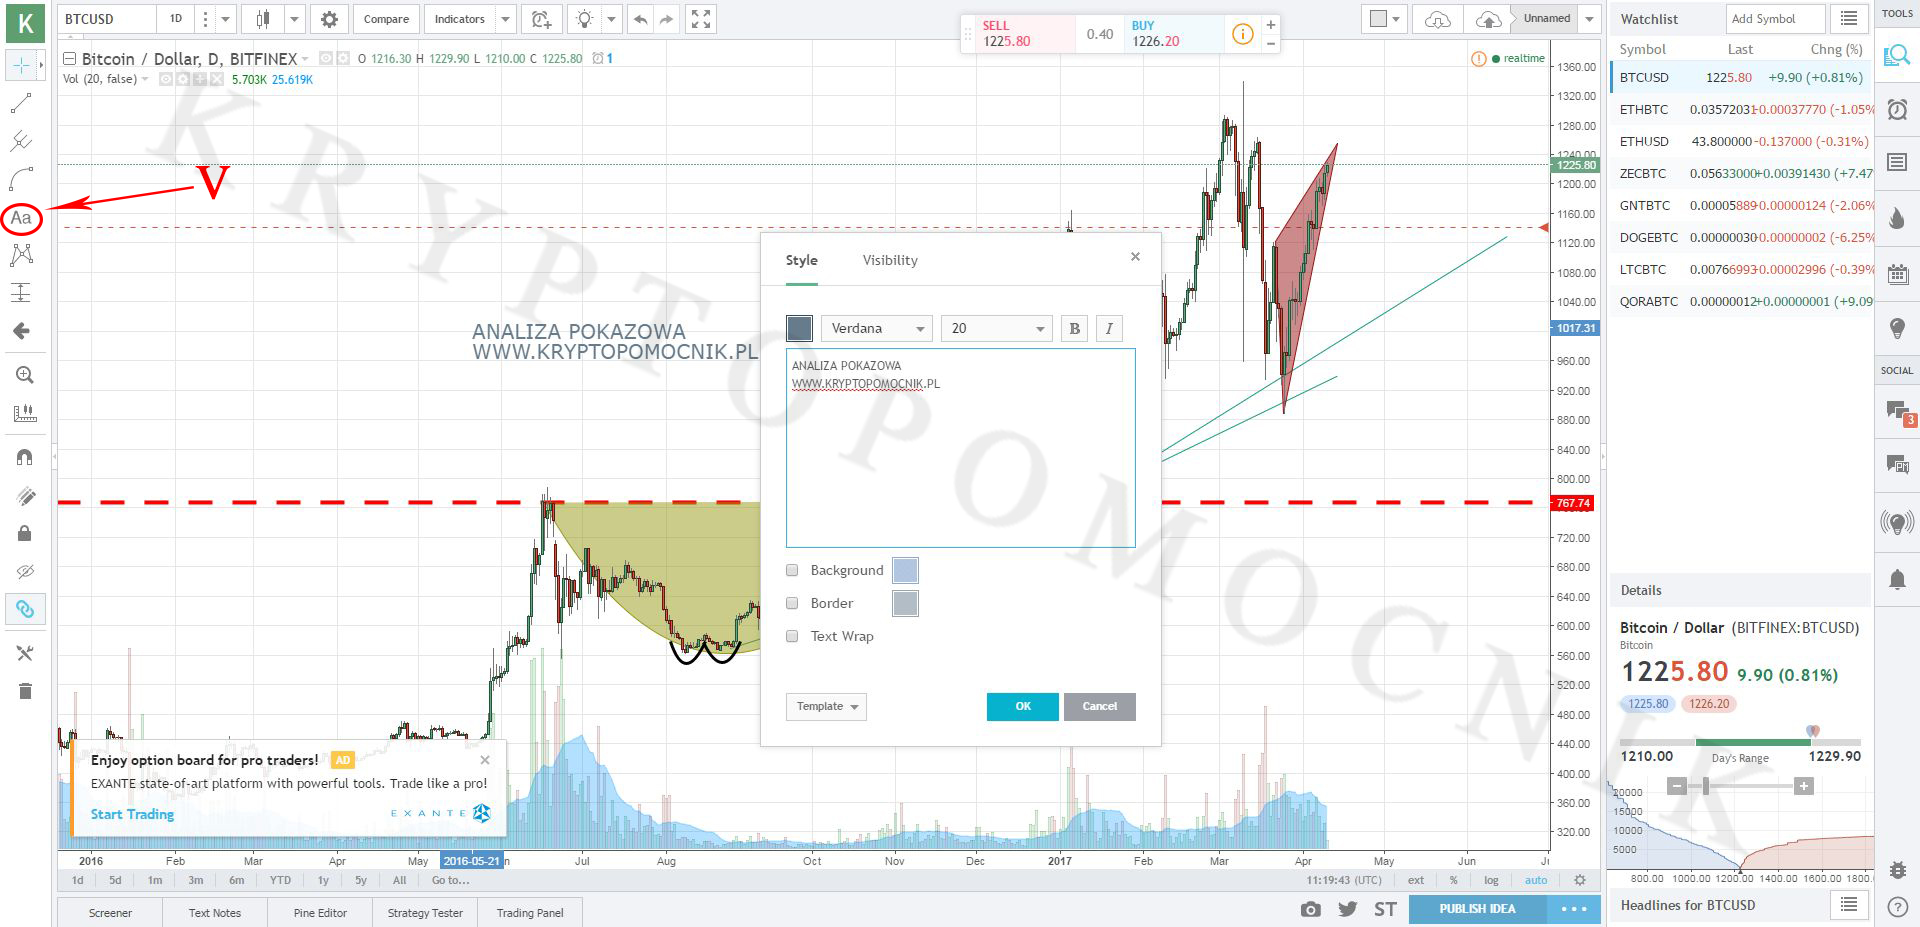 kryptopomocnik.pl Analiza techniczna tradingview